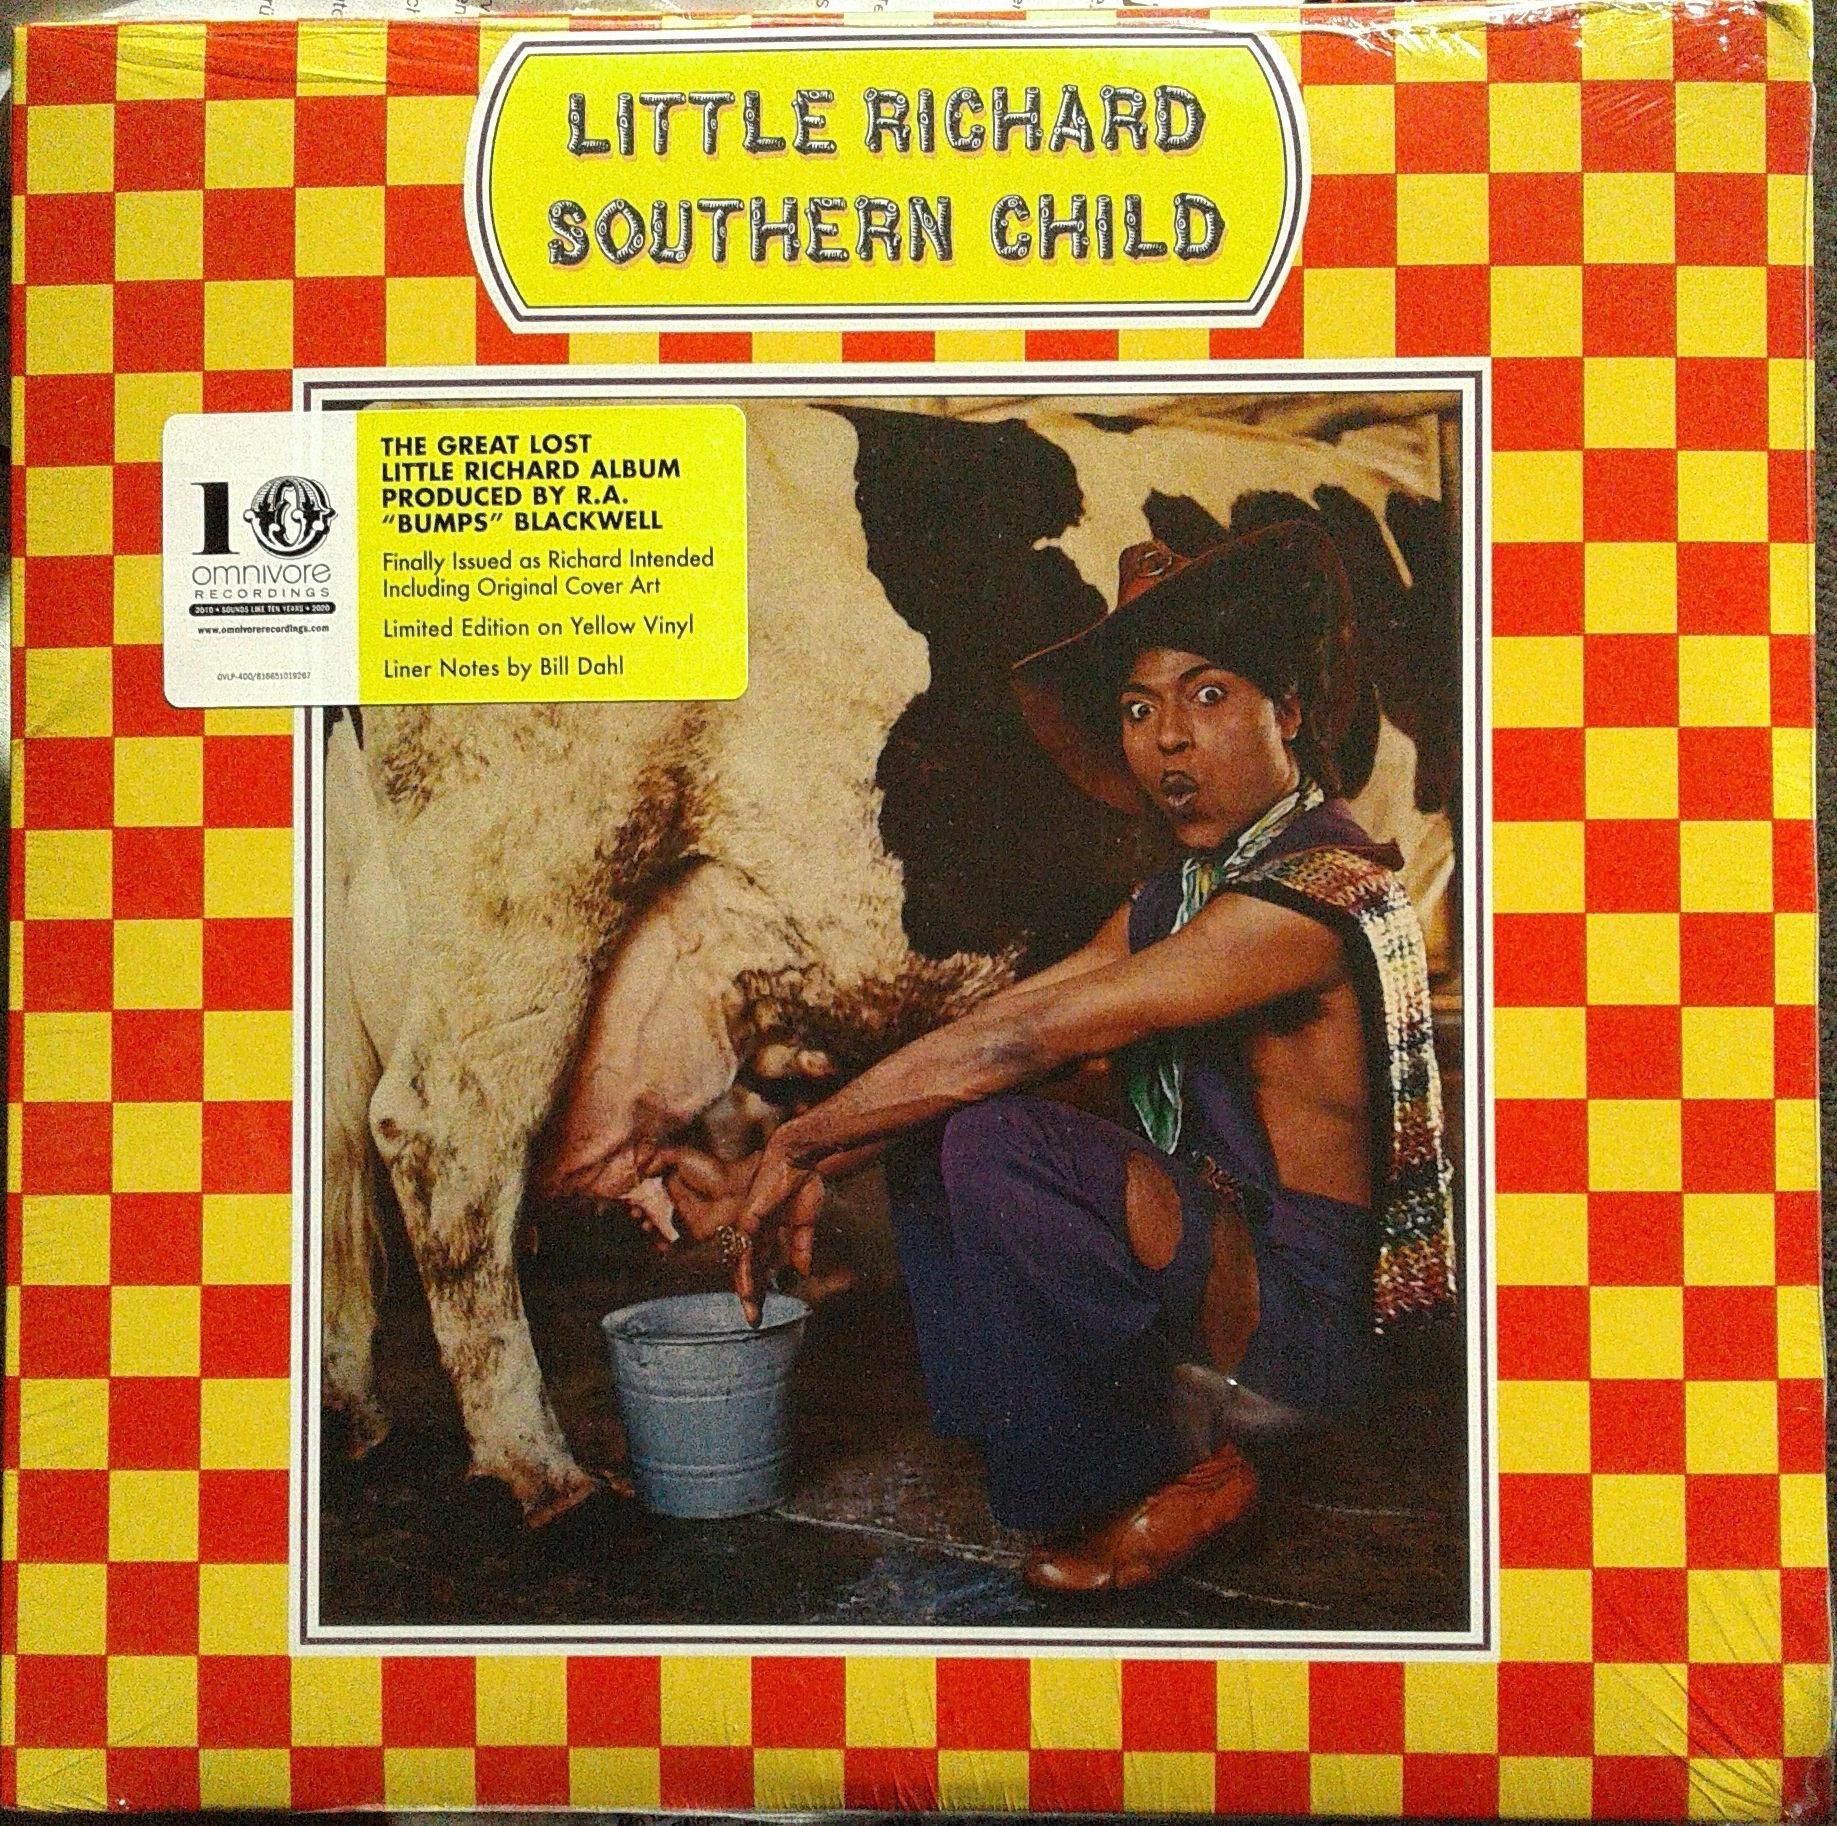 http://music.3sky.de/LittleRichard/LPs/LPcover/southern_child_cova.jpg